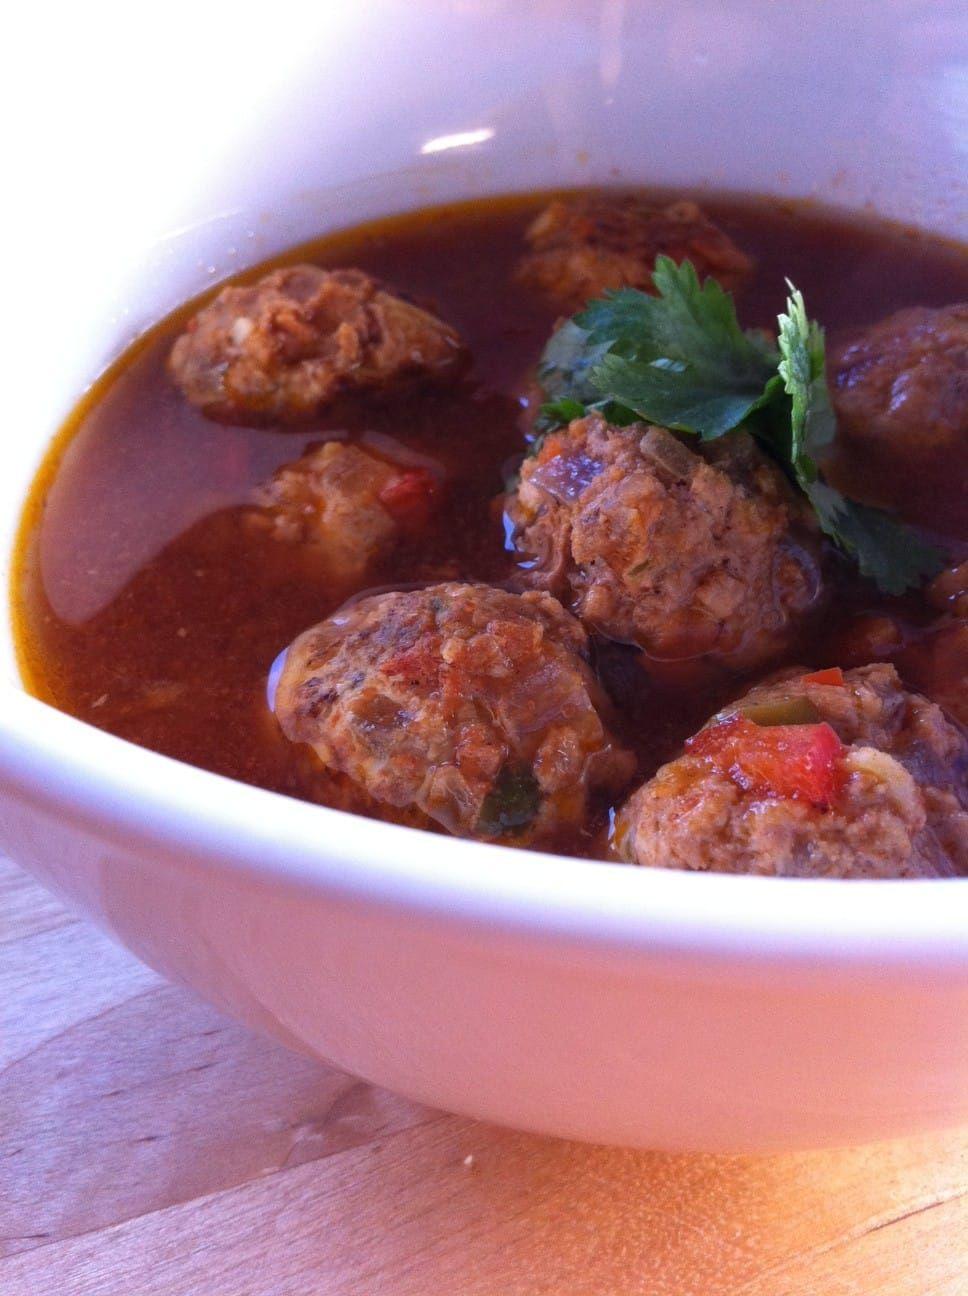 Jaimie's Meatball Soup  Stupid Easy Paleo - https://t.co/pMIP44jIdS https://t.co/QJ5Ww70fv1